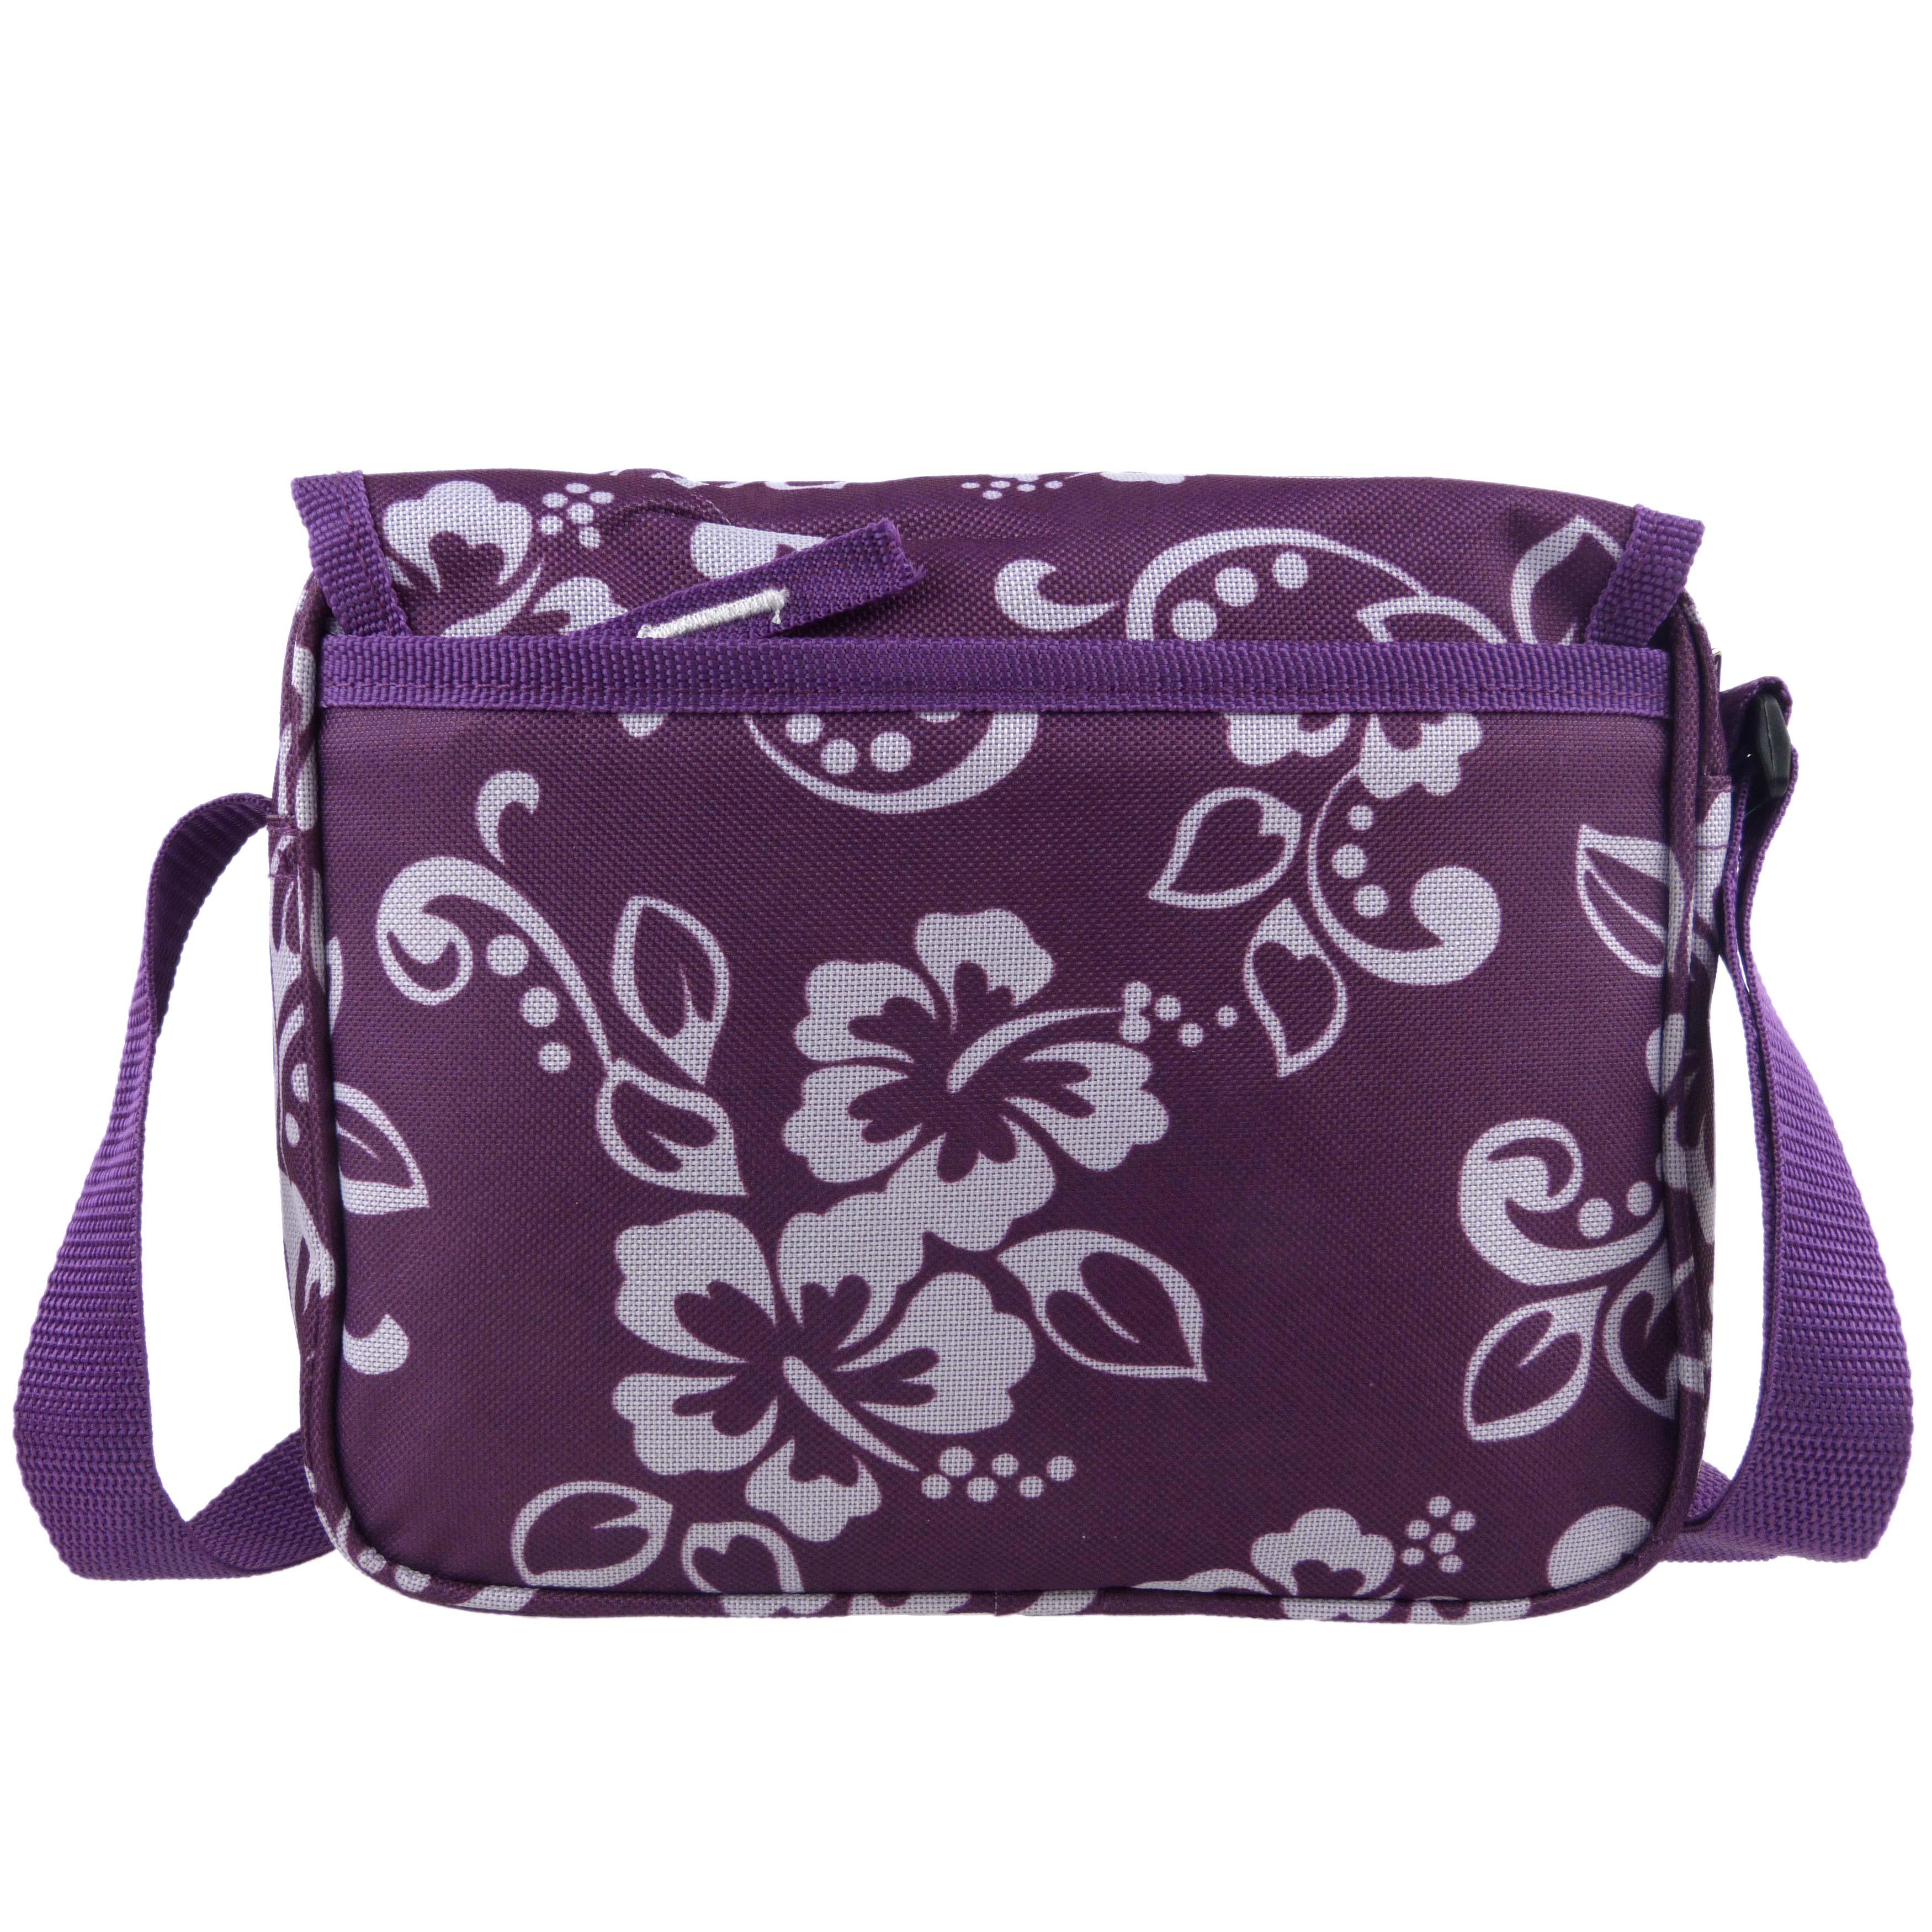 Ladies-Girls-Medium-Hibiscus-Shoulder-Travel-Cross-Body-Bag-by-RED-X-Floral thumbnail 14